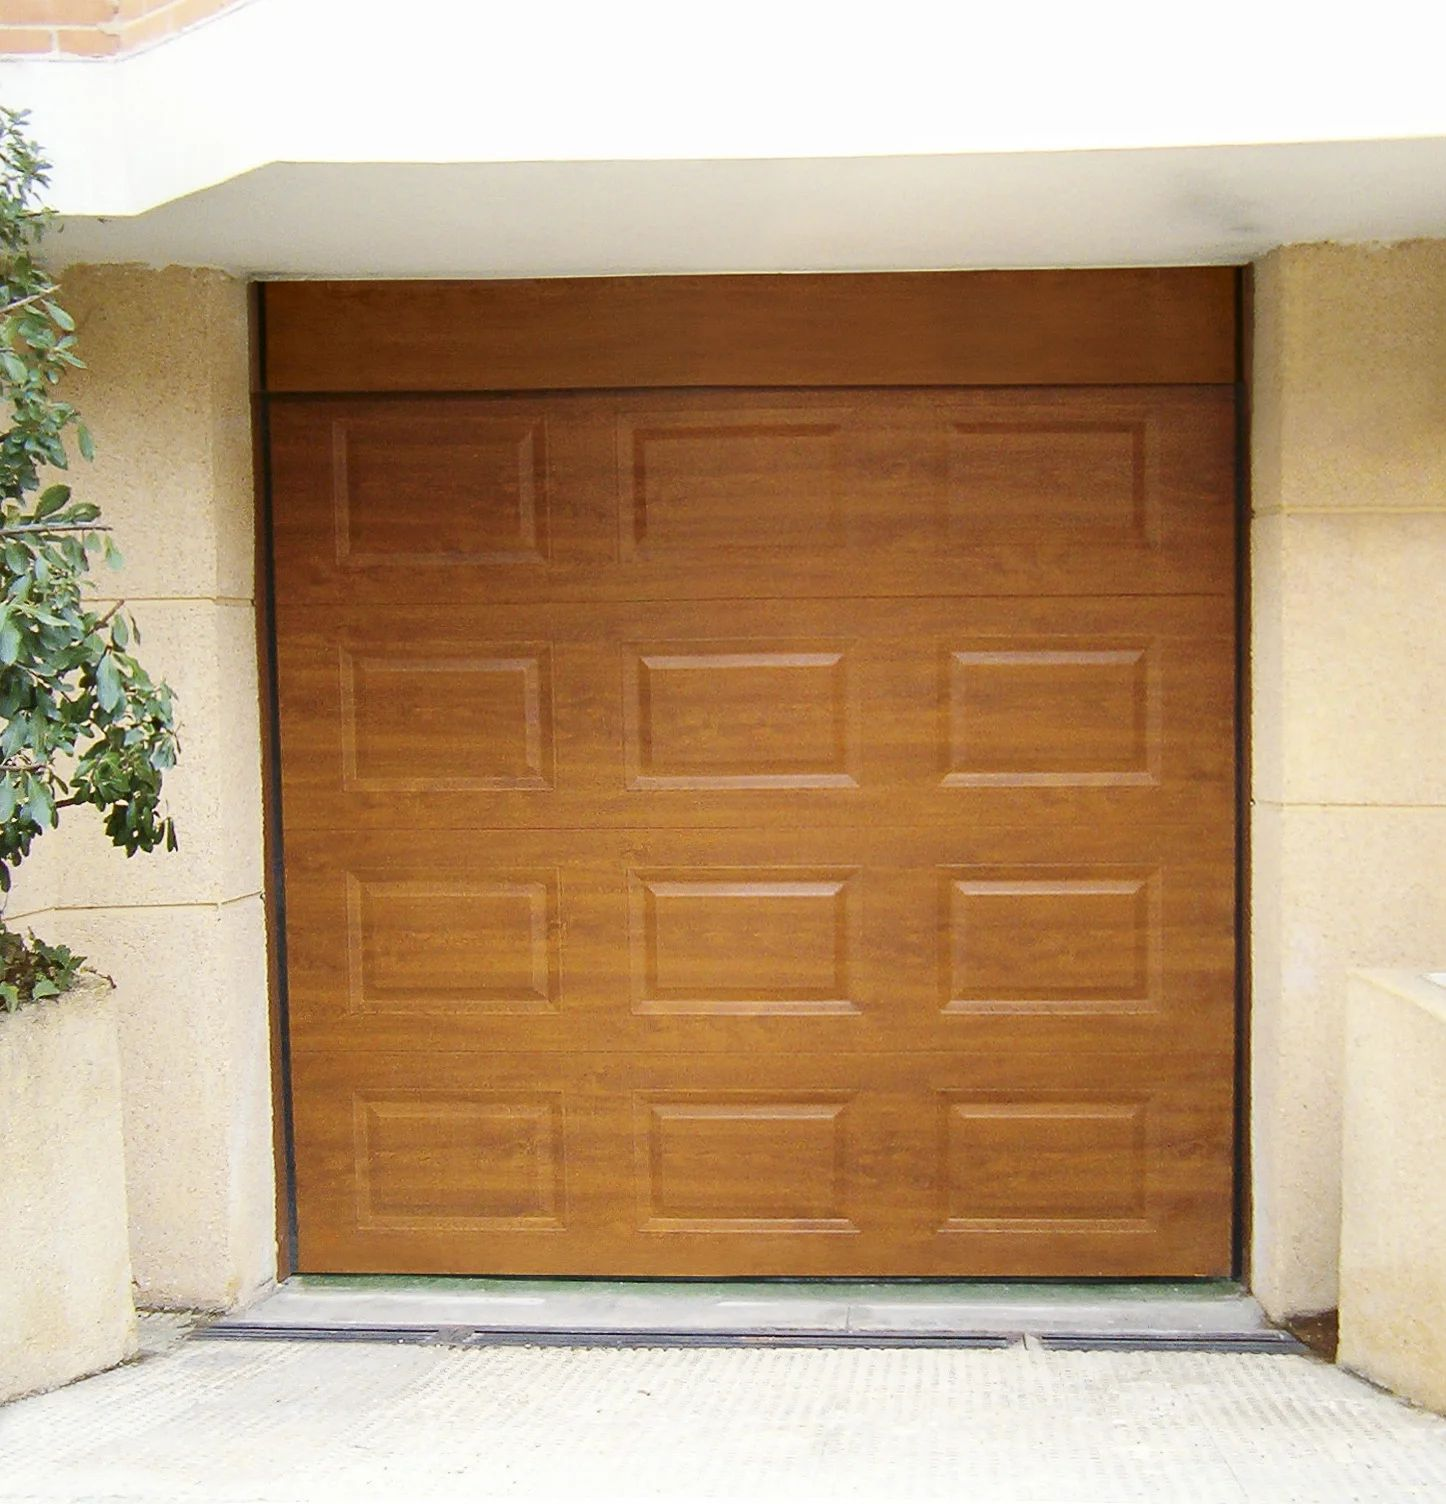 Porte De Garage Sectionnelle Motorisee Artens Essentiel H 200 X L 300 Cm Leroy Merlin